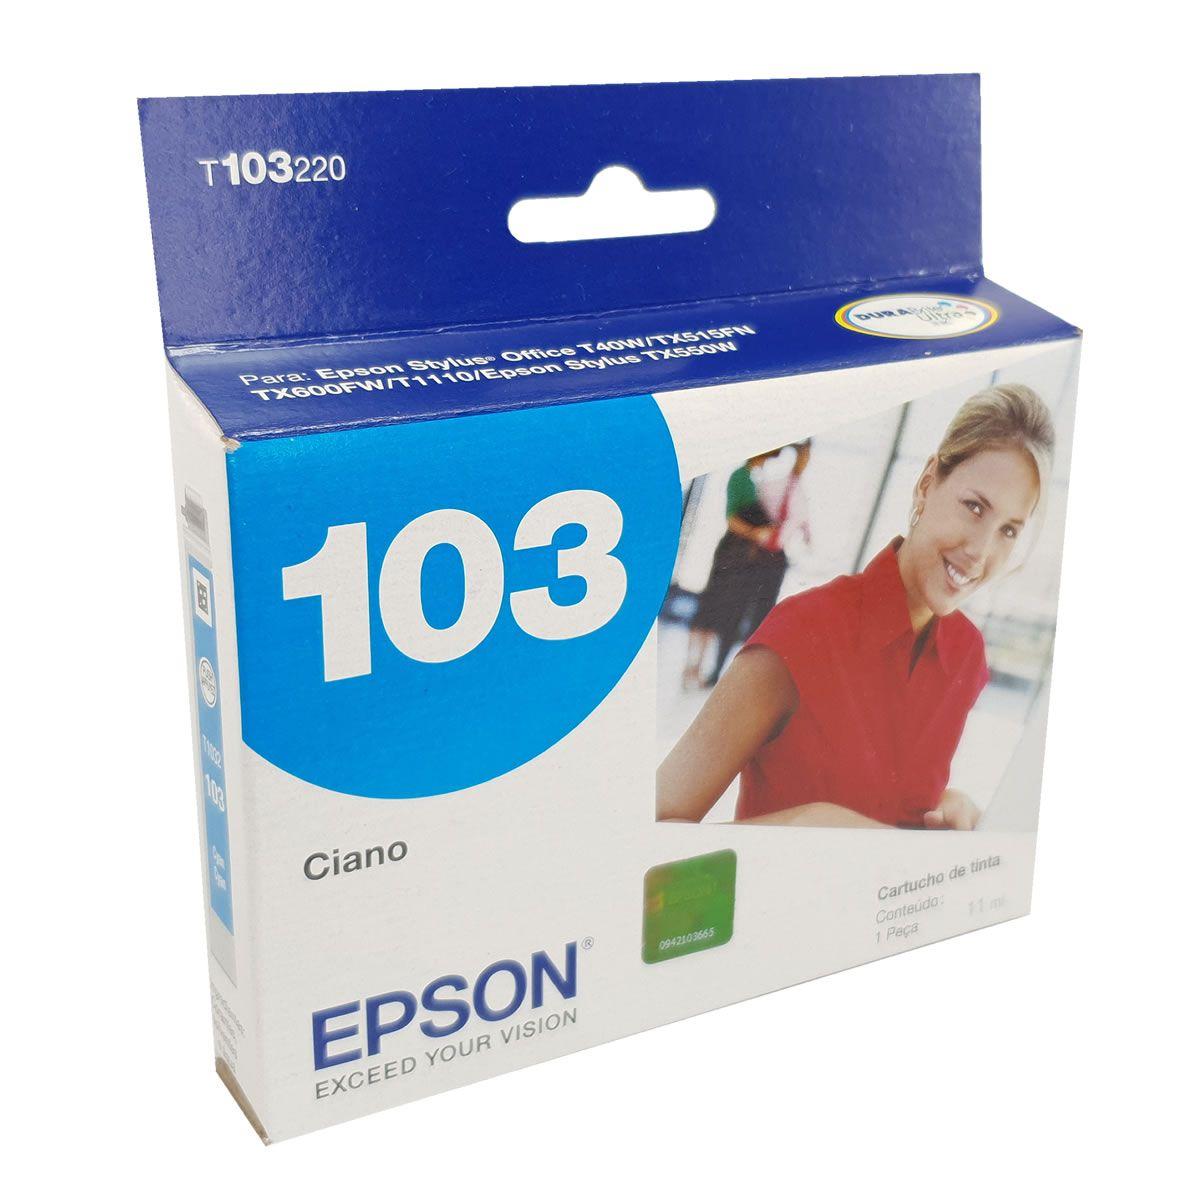 Cartucho EPSON T103220 T103 103 Ciano para T40W TX600FW TX550W